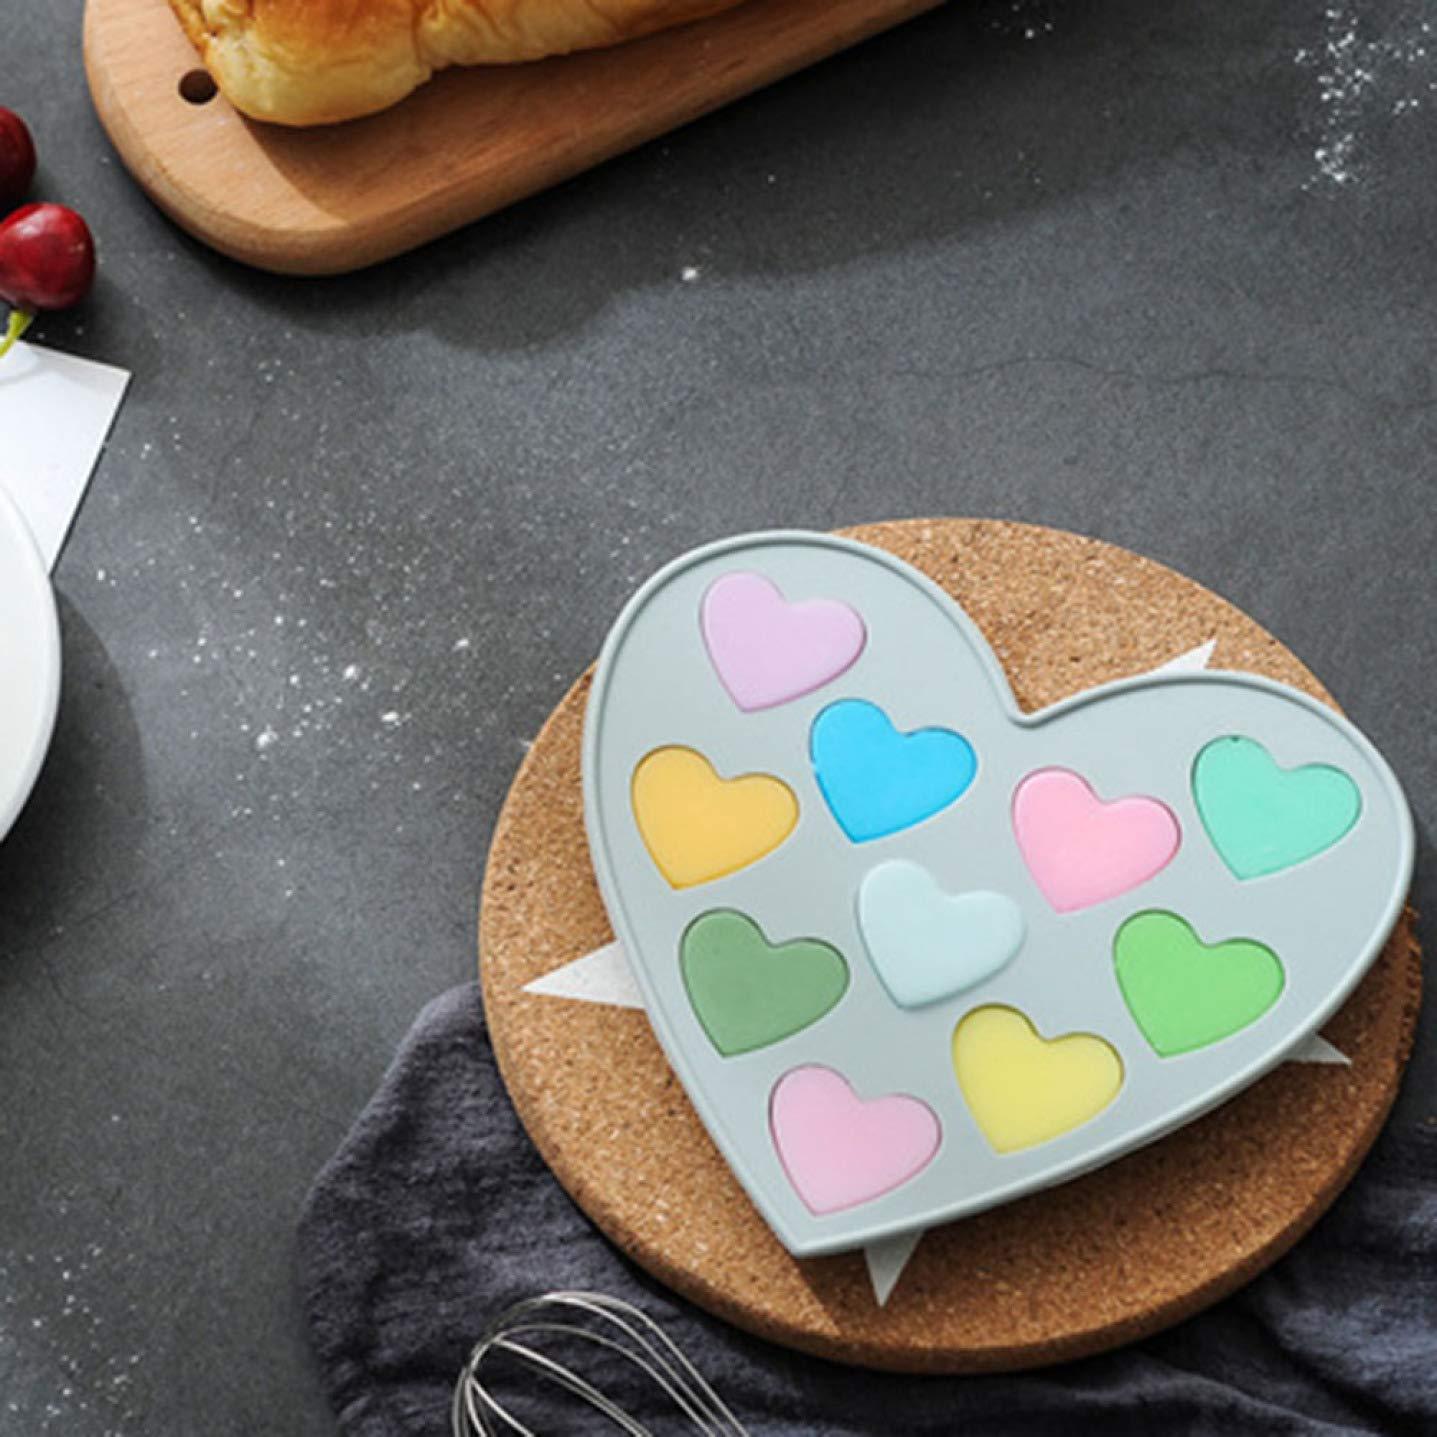 HLifuz Faultless Candy Gussform Tabletts Blau Lebensmittel Qualit/ät Silikon Backform No-Sticky Kuchen Dekoration Form f/ür Mousse,Eiscreme,Schokolade Brownie,K/äsekuchen,Fondant und Mor